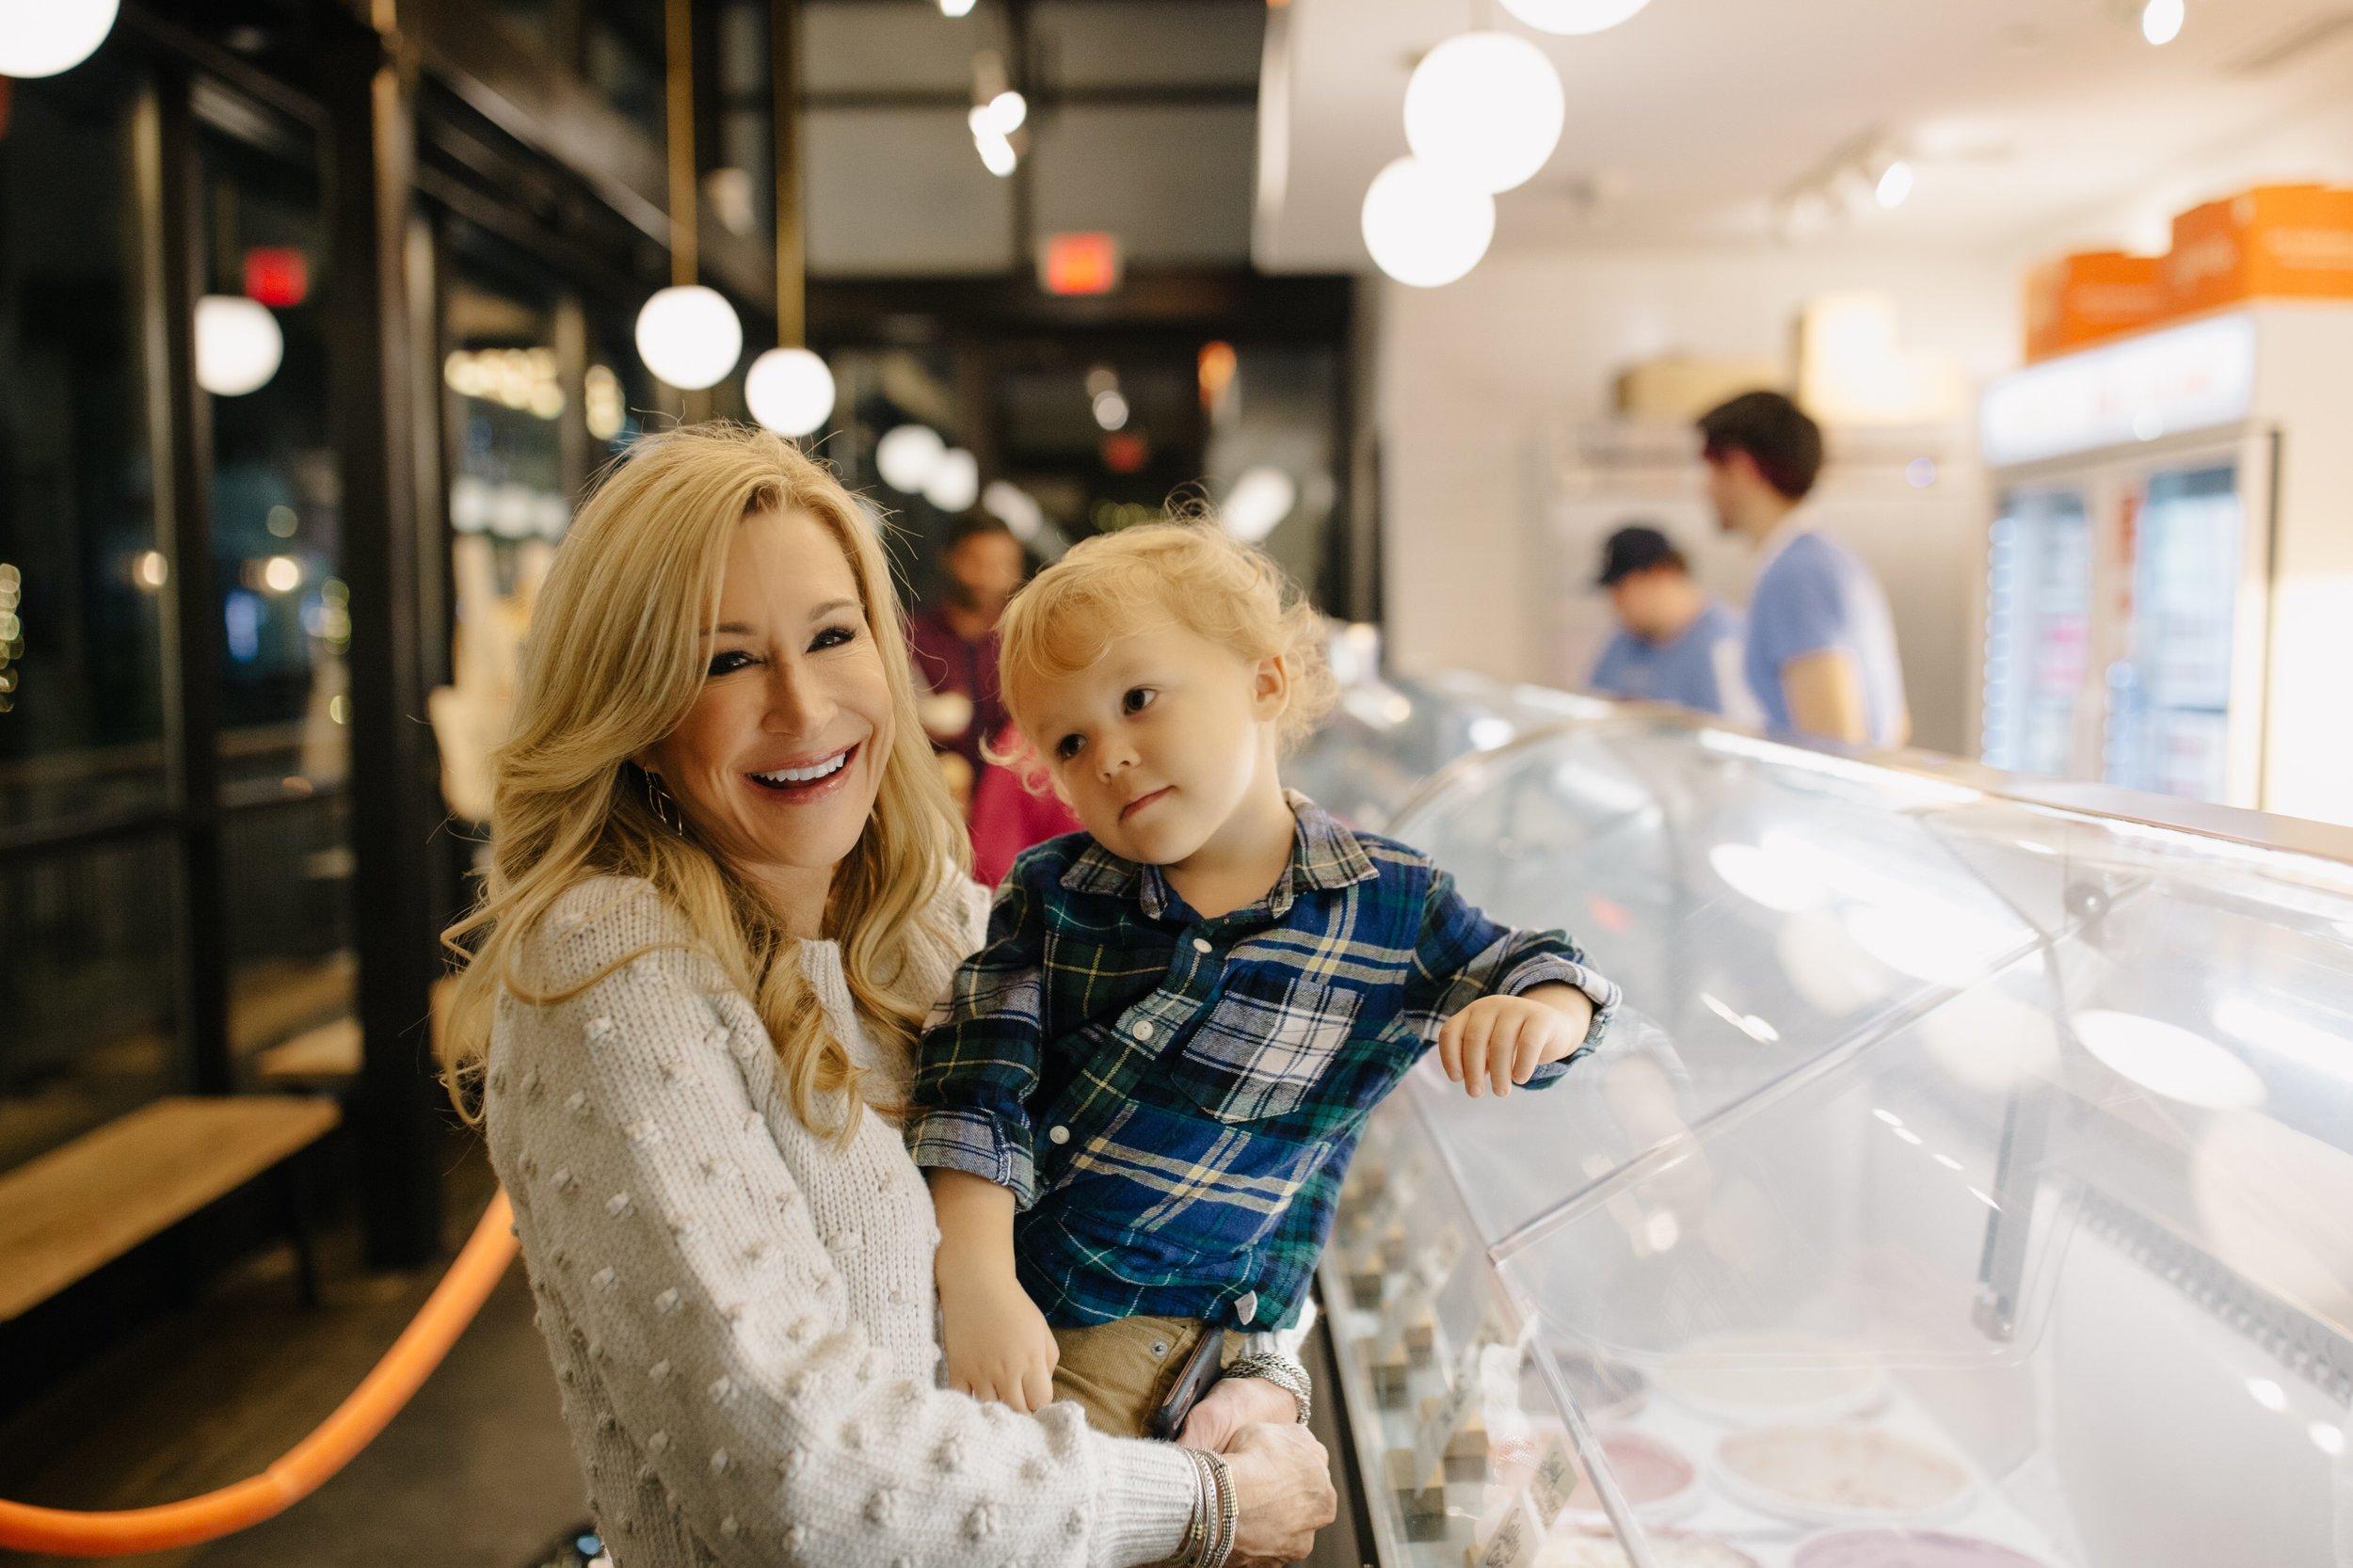 Having ice cream at Jeni's - Crazy Blonde Life